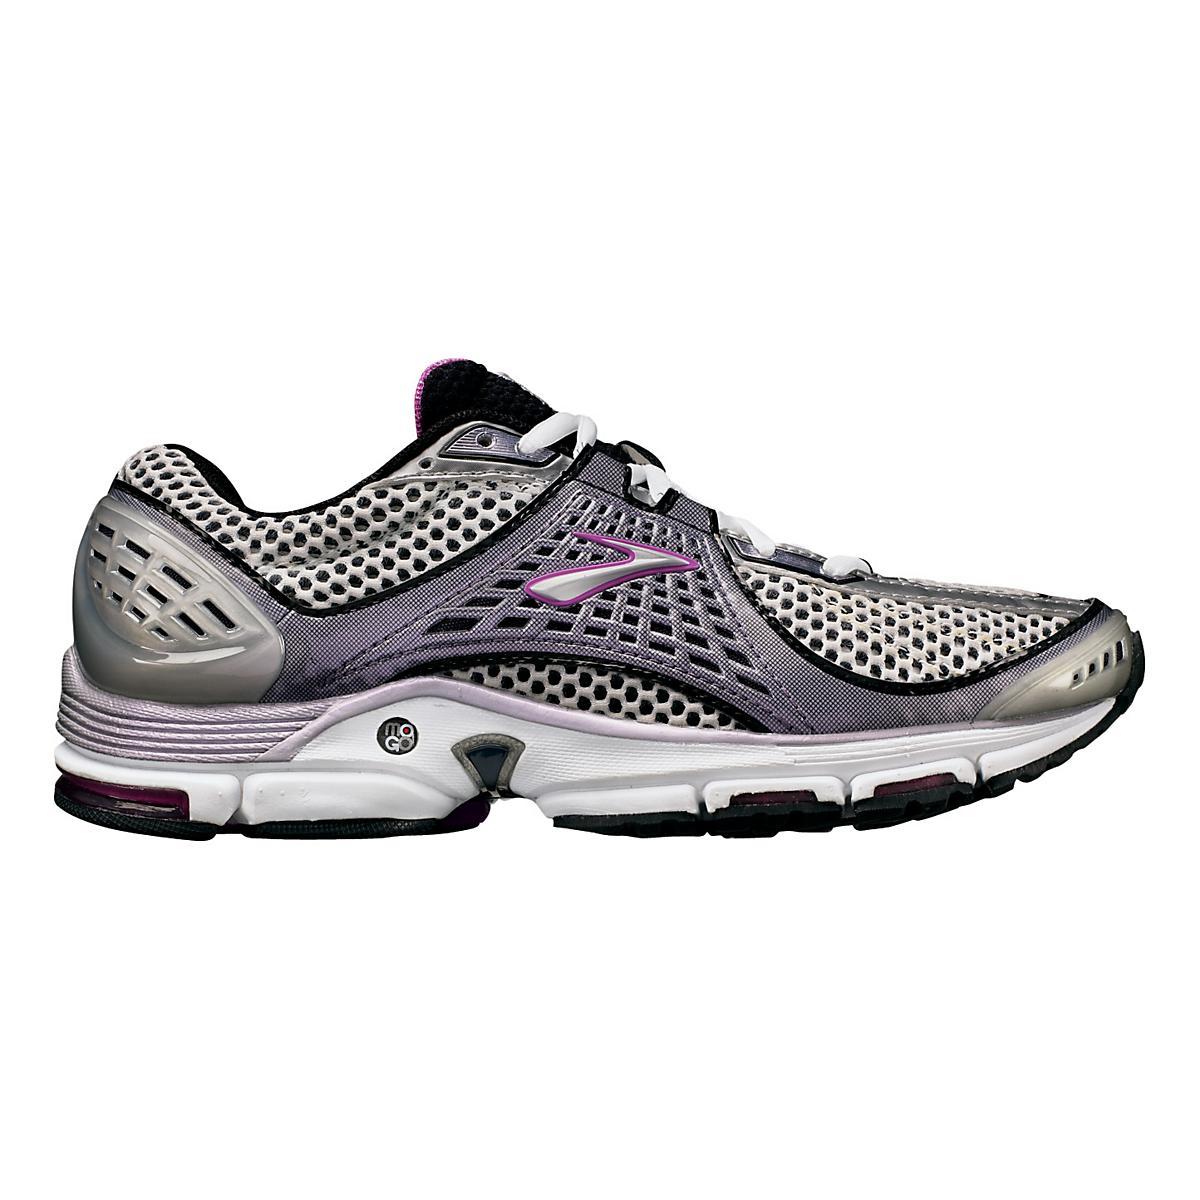 cb232ed6d07 Womens Brooks Trance 7 Running Shoe at Road Runner Sports